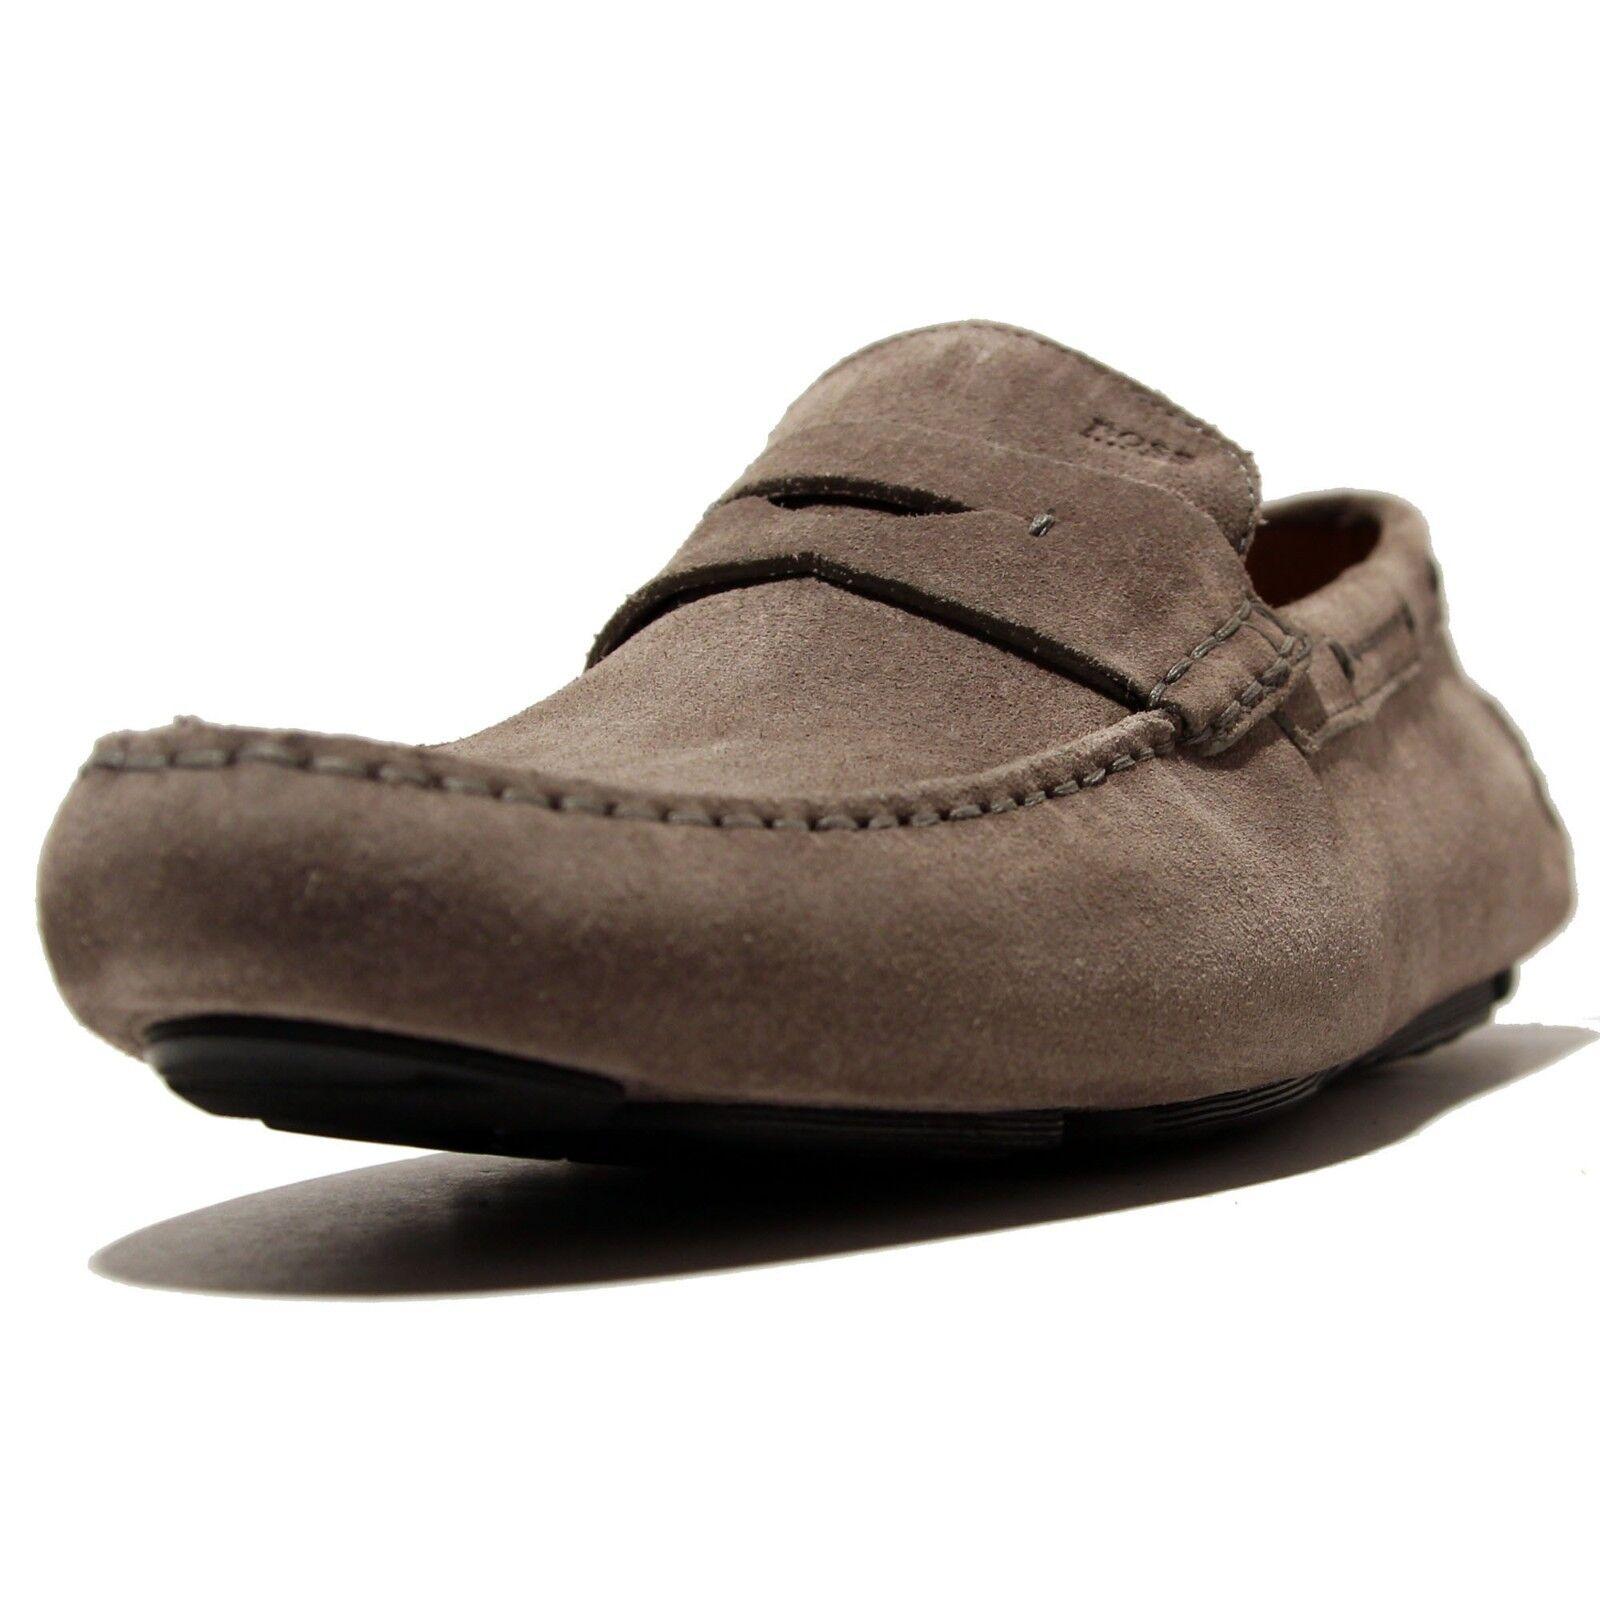 HUGO BOSS gris Cuir Mocassins Chaussures 7.5 40.5 Chaussures De Loisirs Hommes Pilote marron